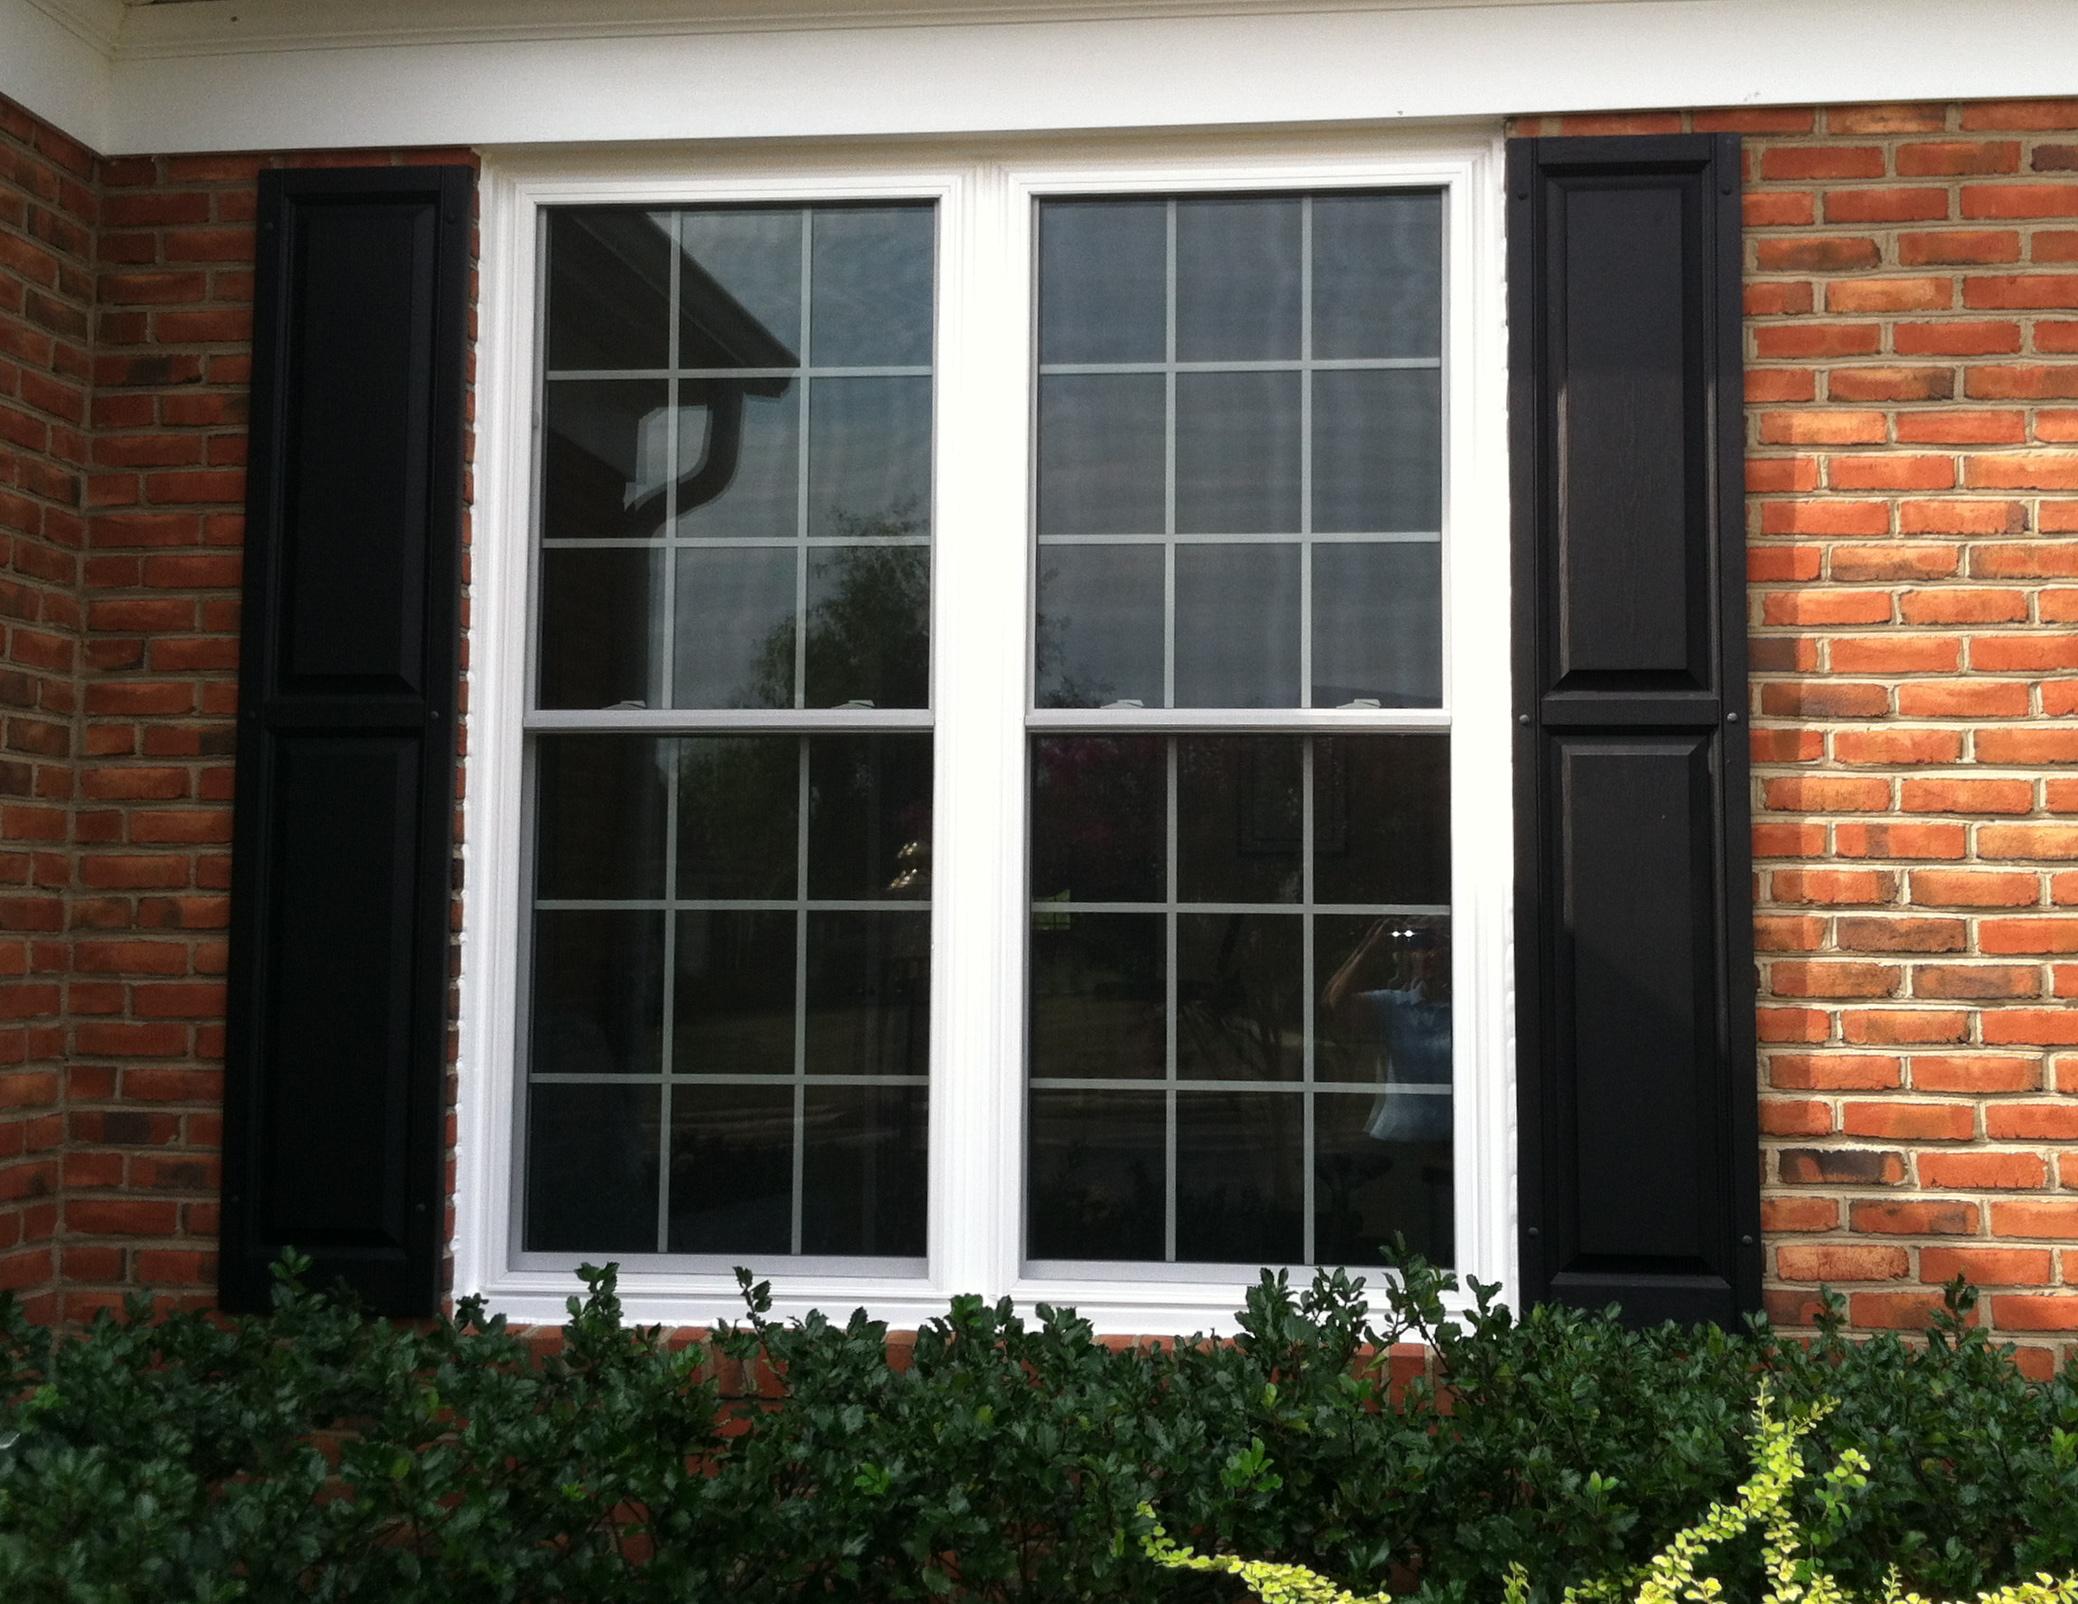 best fiberglass windows learn the top questions when deciding between vinyl and fiberglass windows home improvement blog on washington